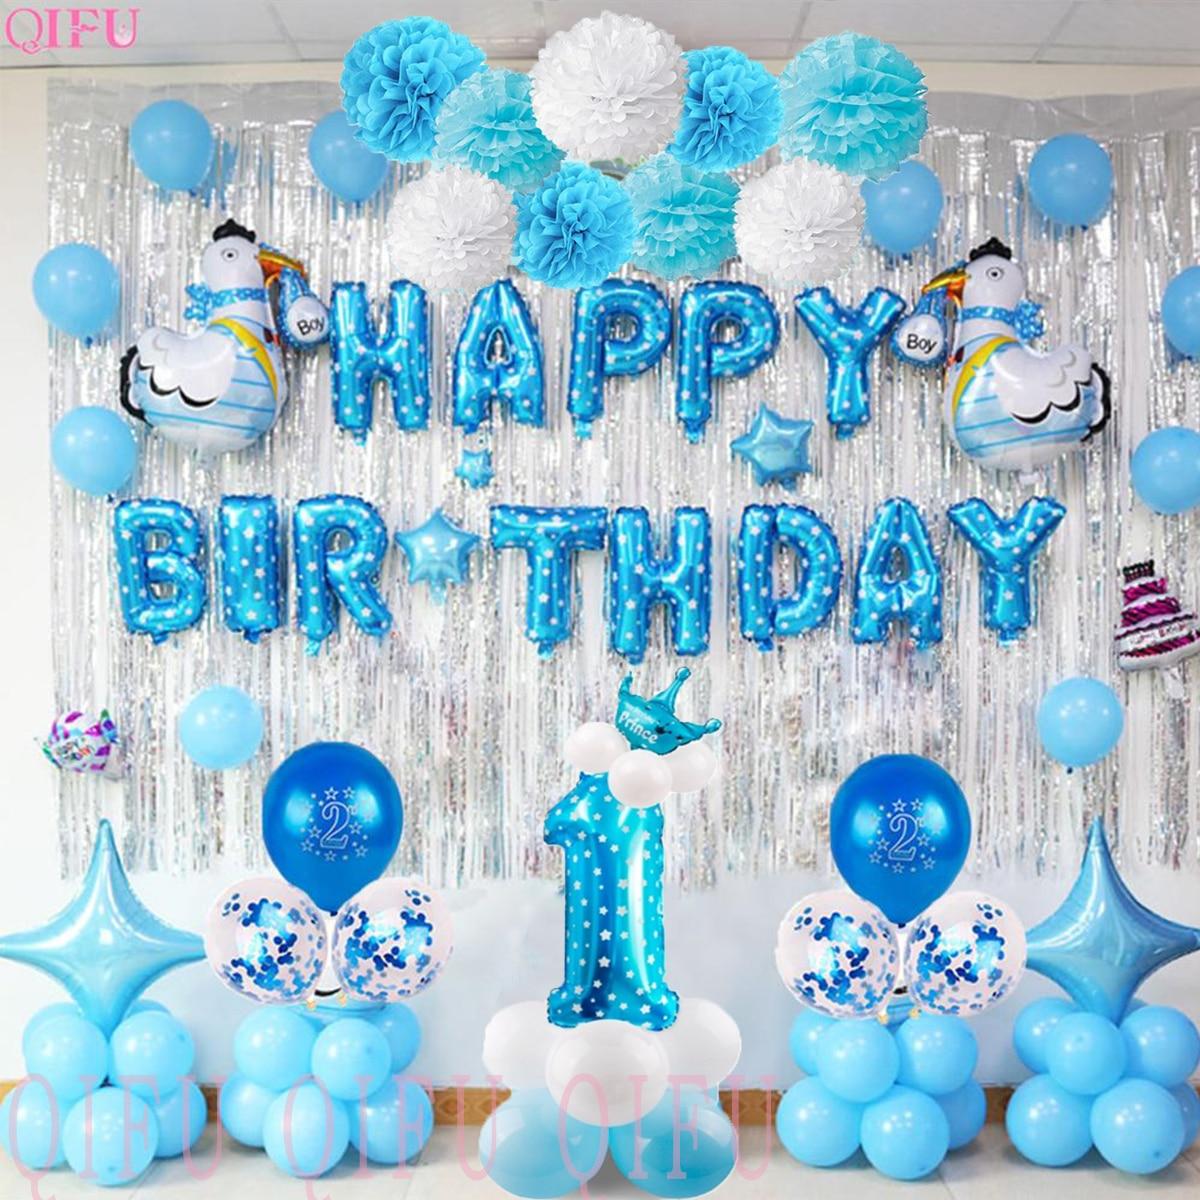 Qifu 1 Birthday Boy 1st Birthday Party Decorations Kids My First Birthday Blue Party Decor Foil Balloons Baby Boy I Am One Year Party Diy Decorations Aliexpress